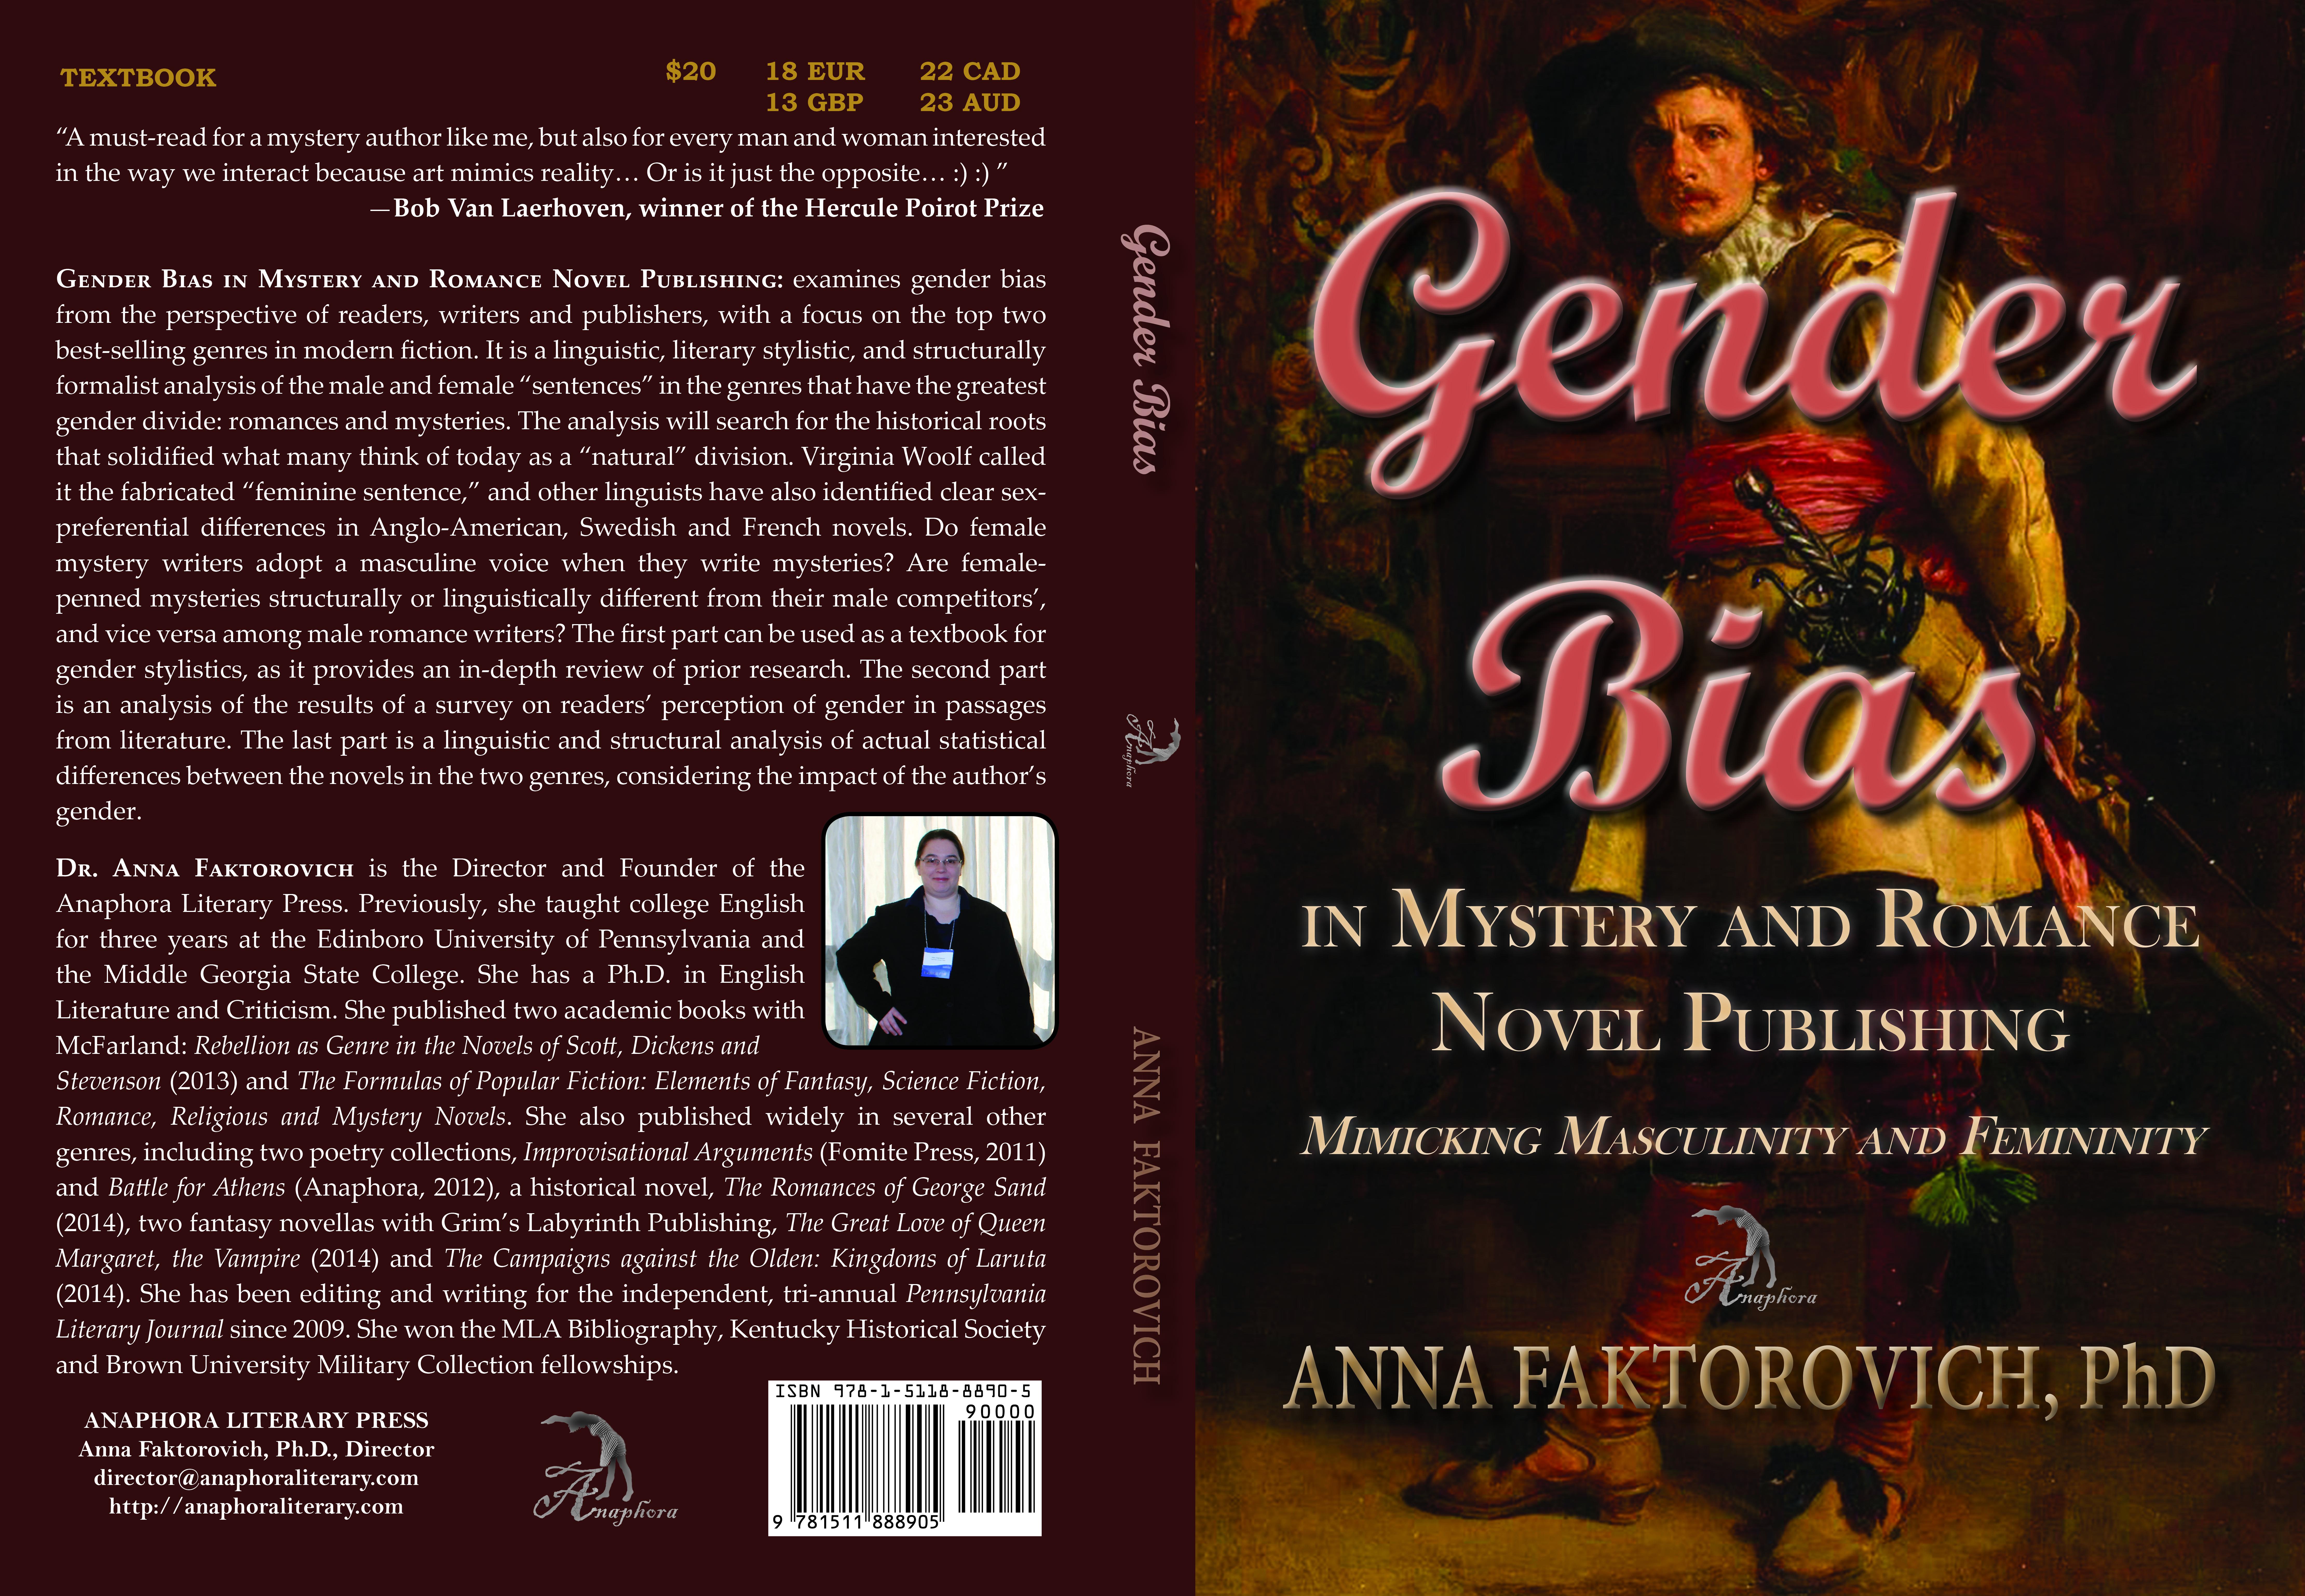 Anna faktorovich anaphora literary press faktorovich gender bias cover 9781511888905 edited fandeluxe Images